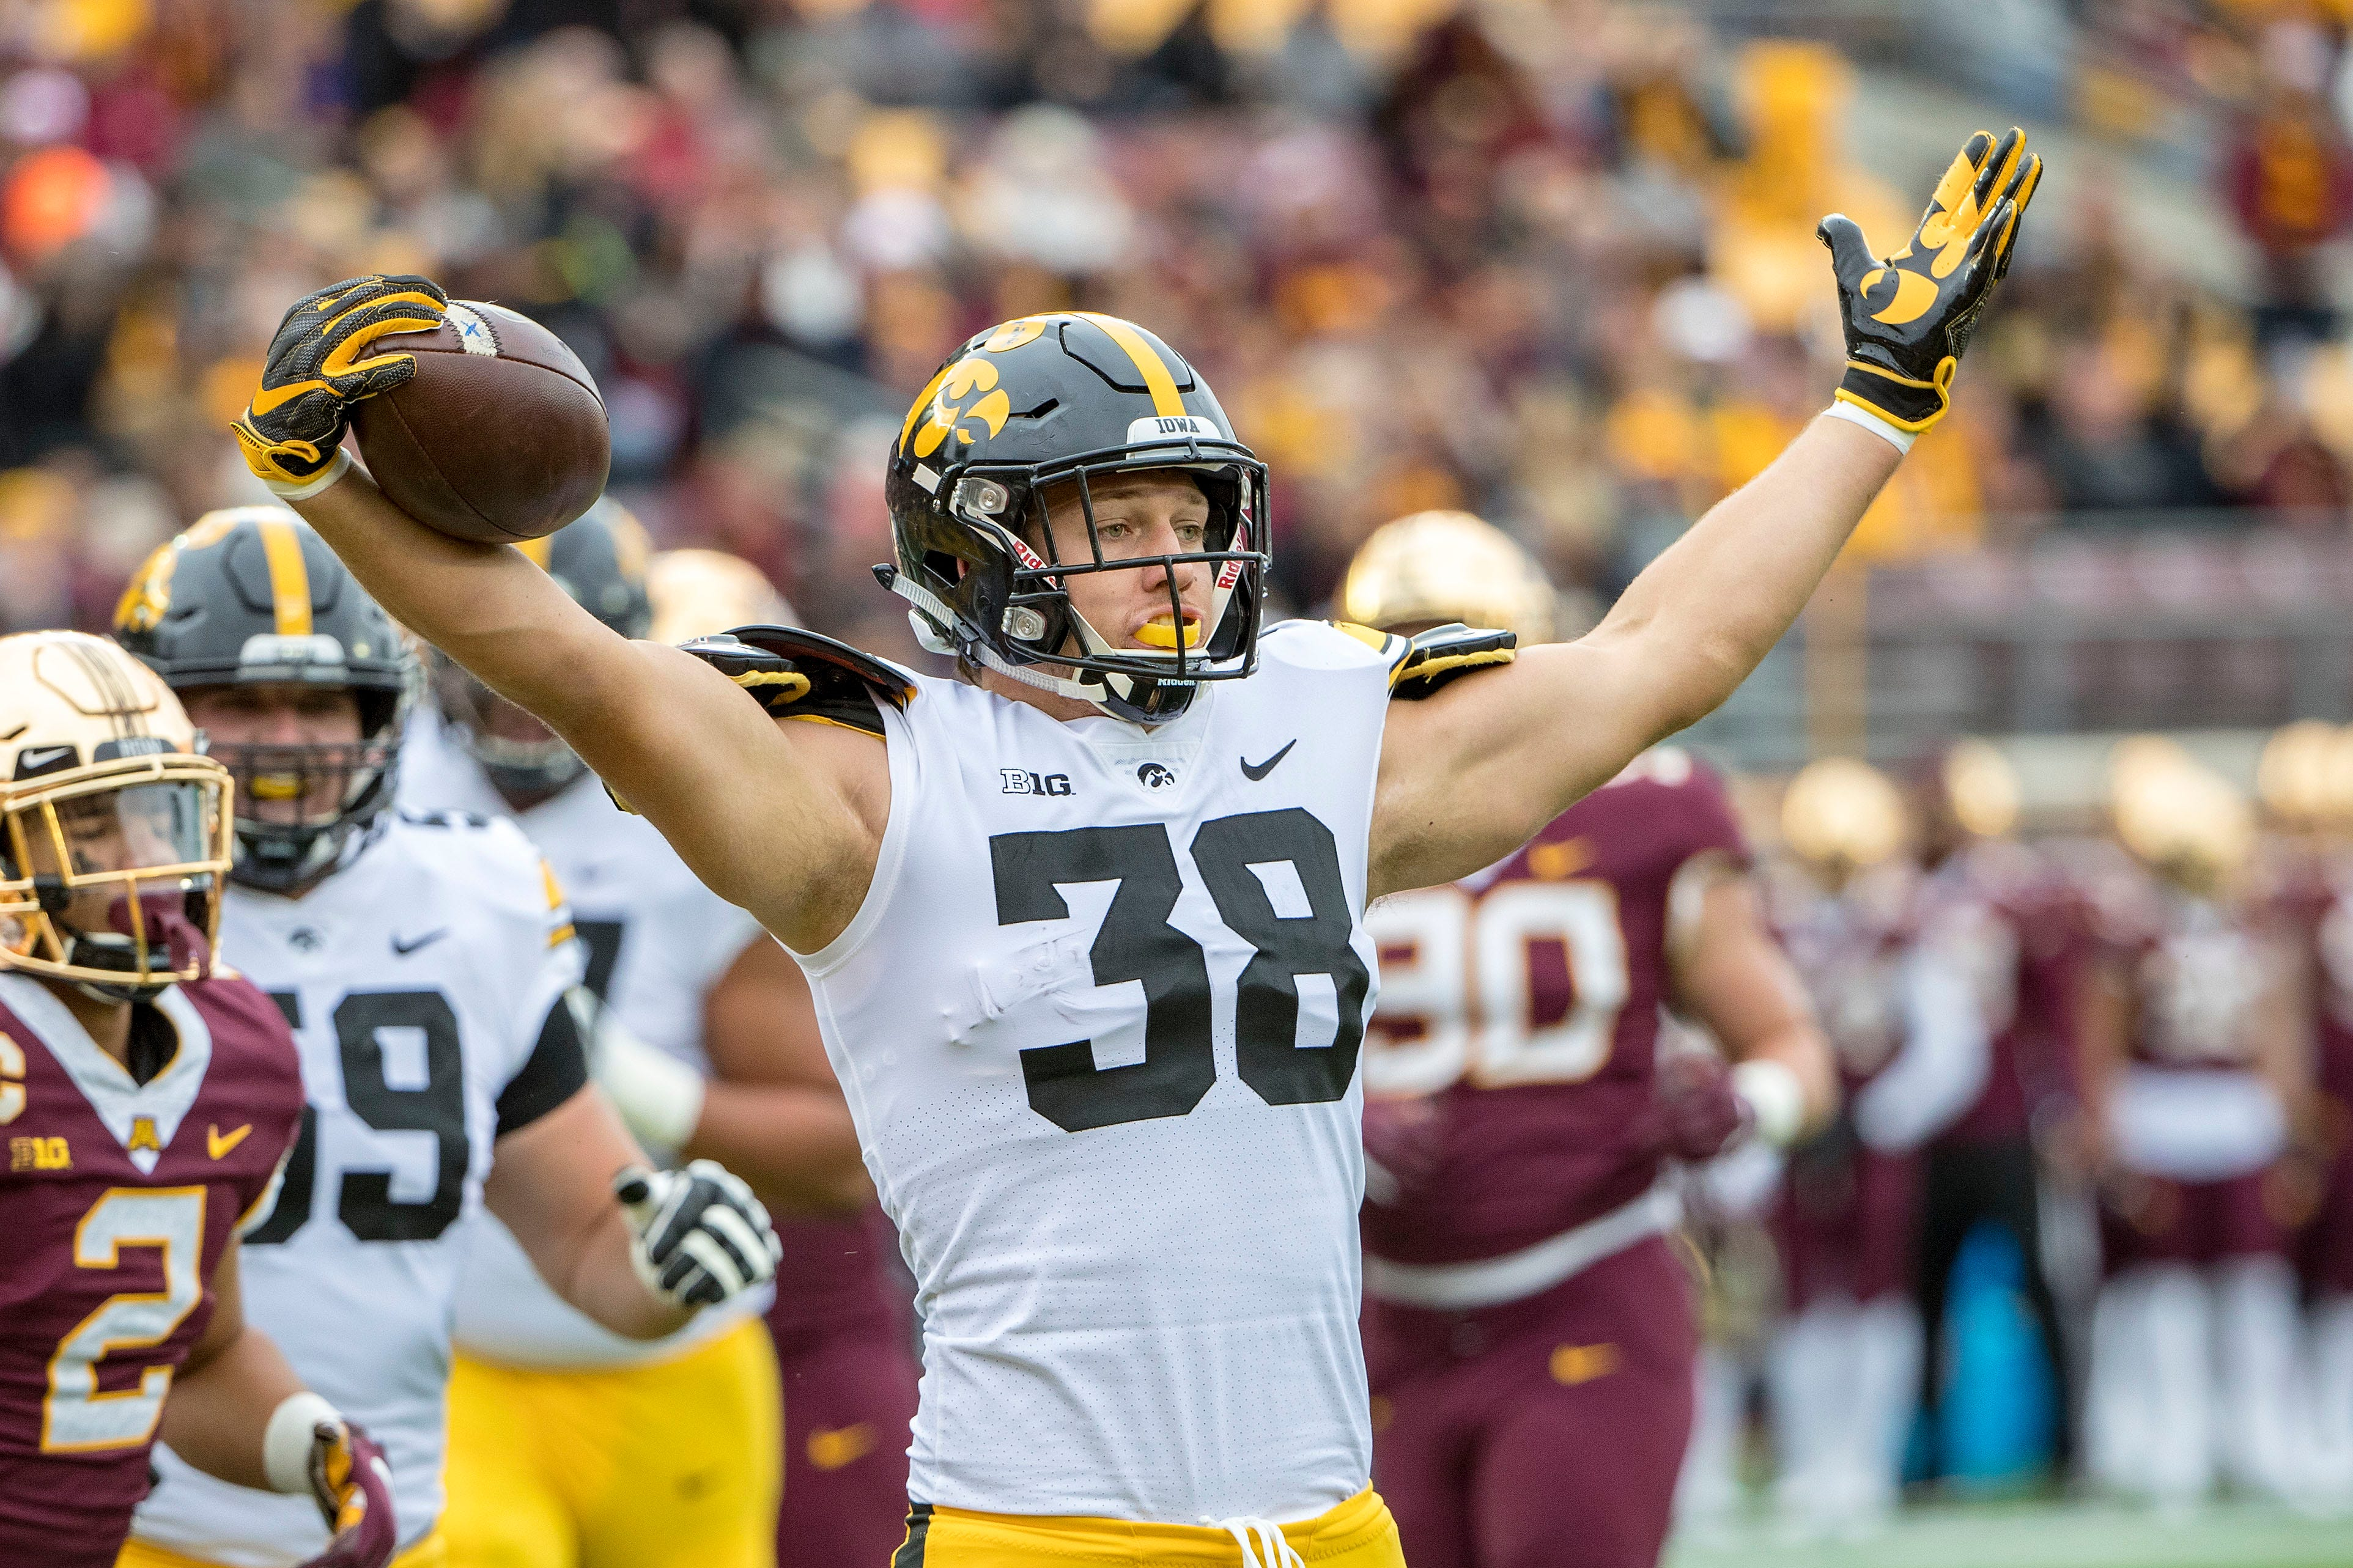 Chariton Iowa is buzzing about T.J. Hockenson's NFL Draft prospects